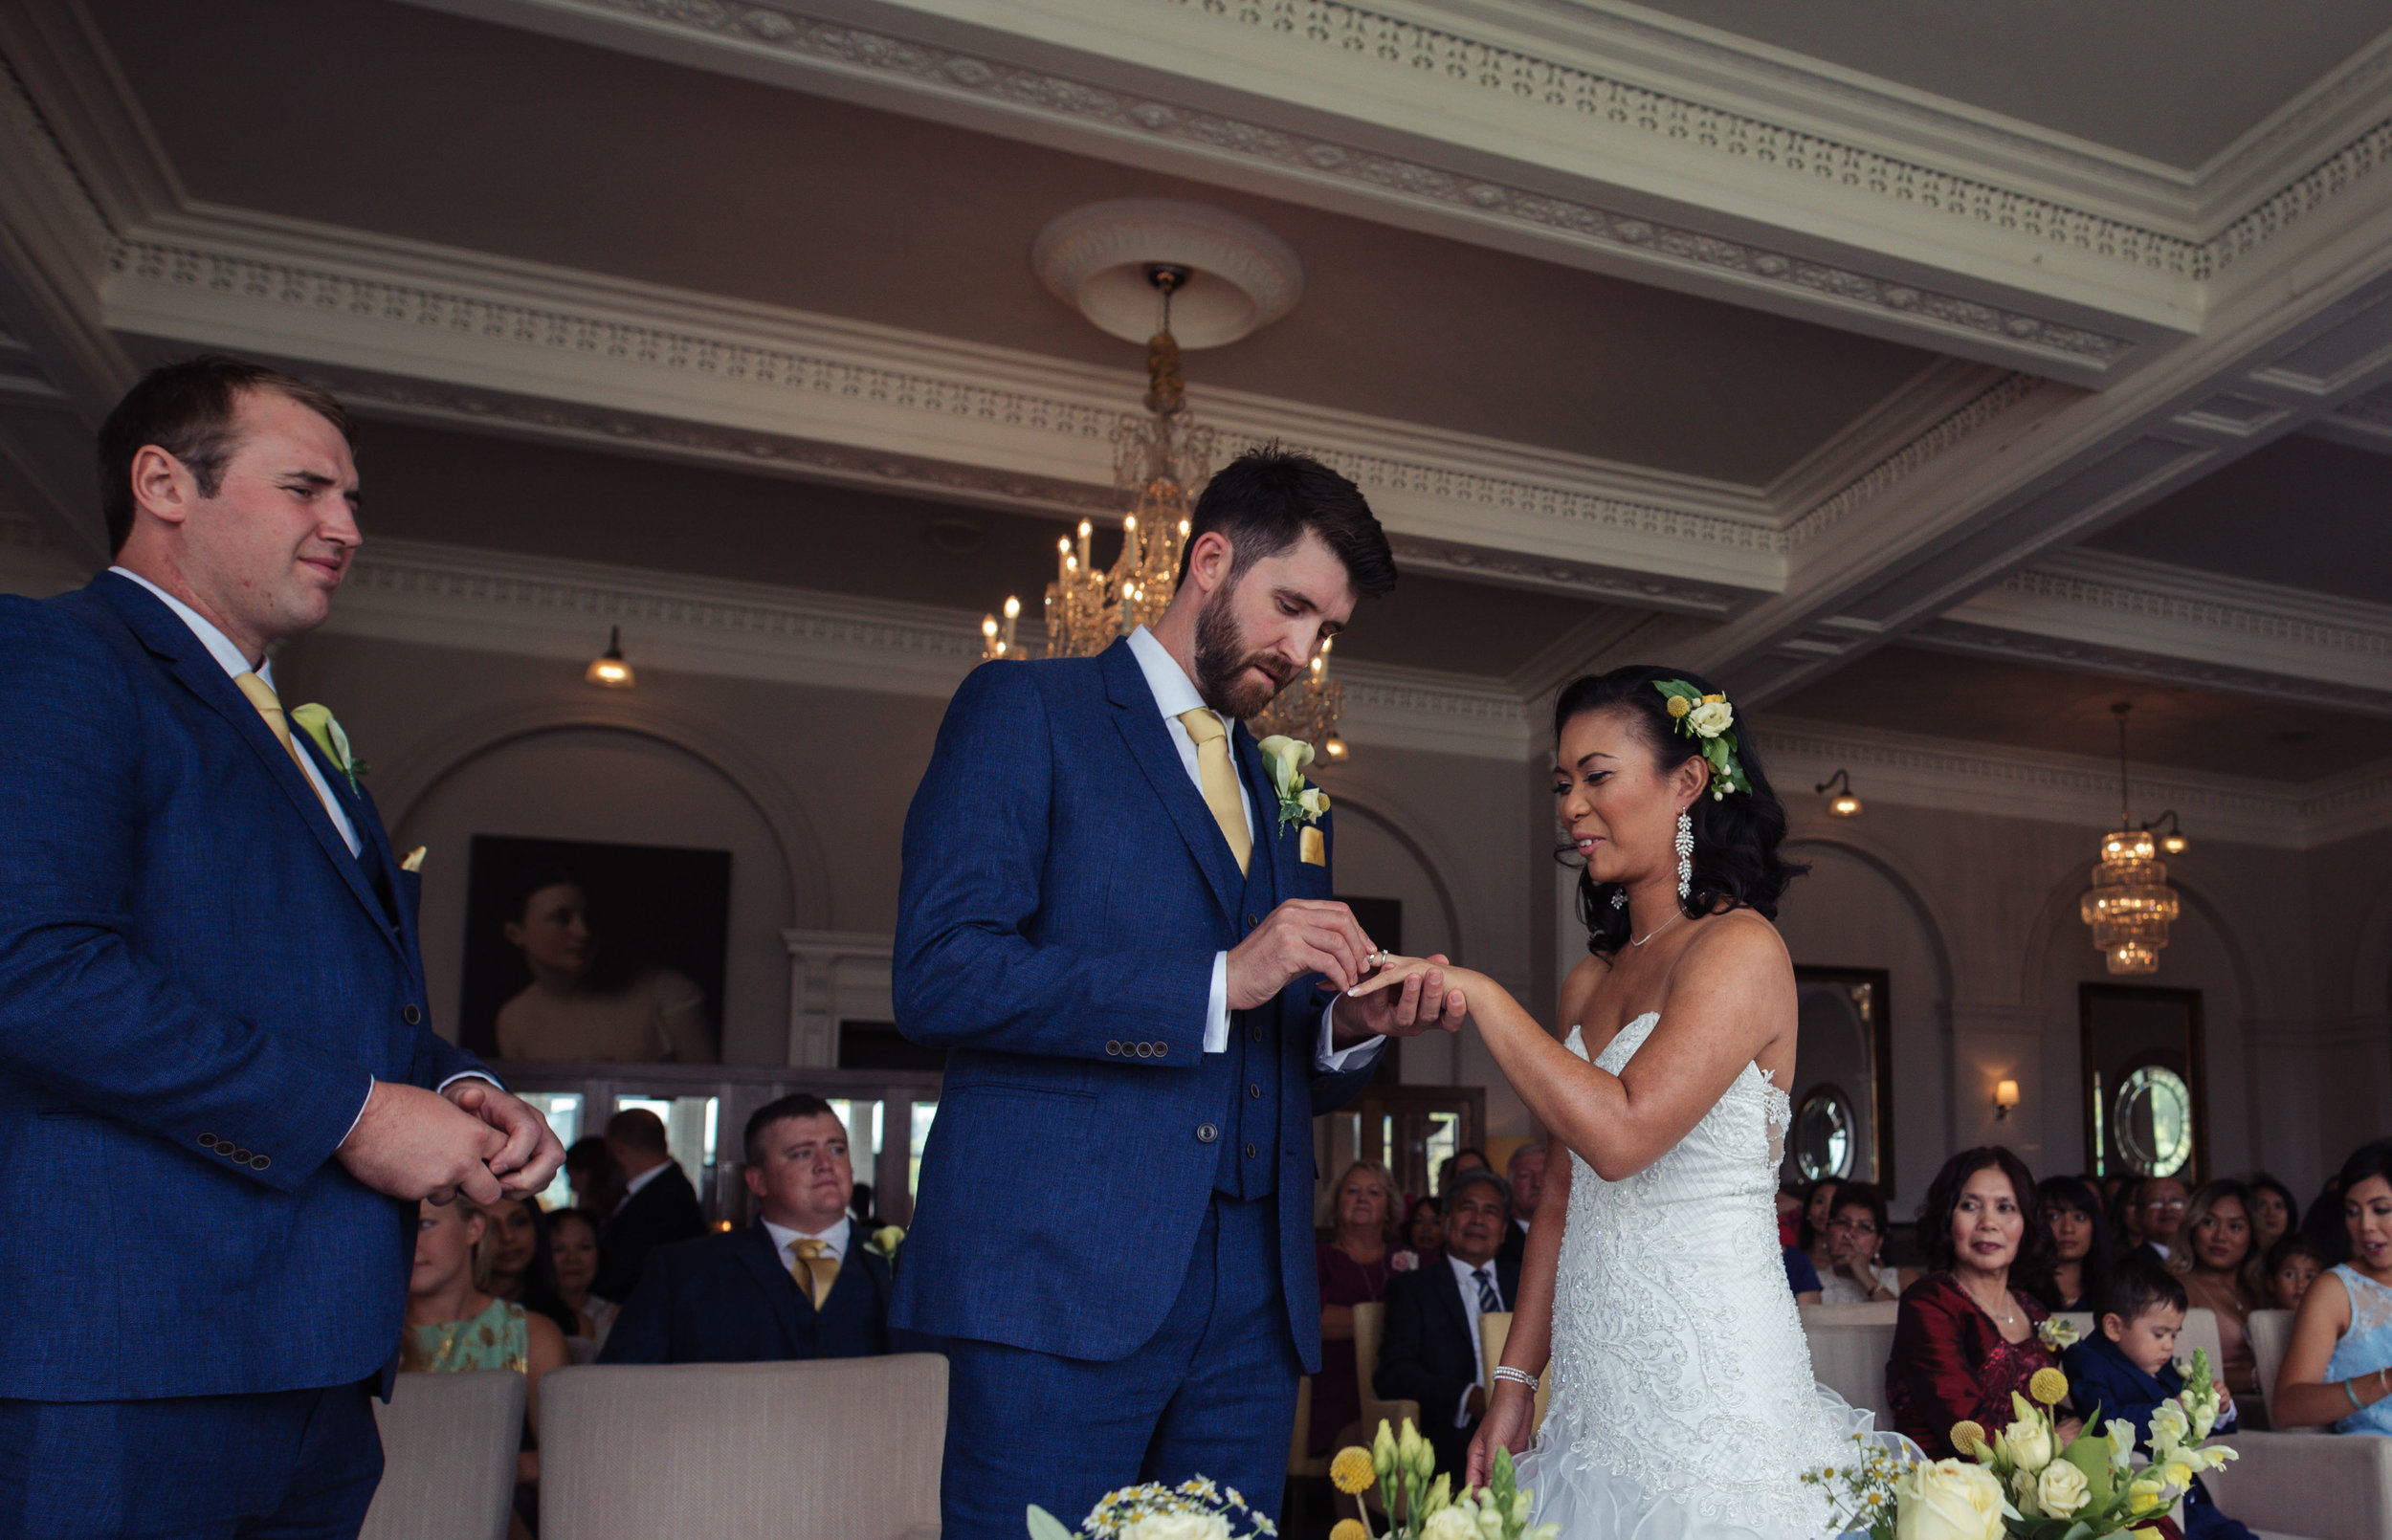 Belsfield Wedding Photography-35.jpg